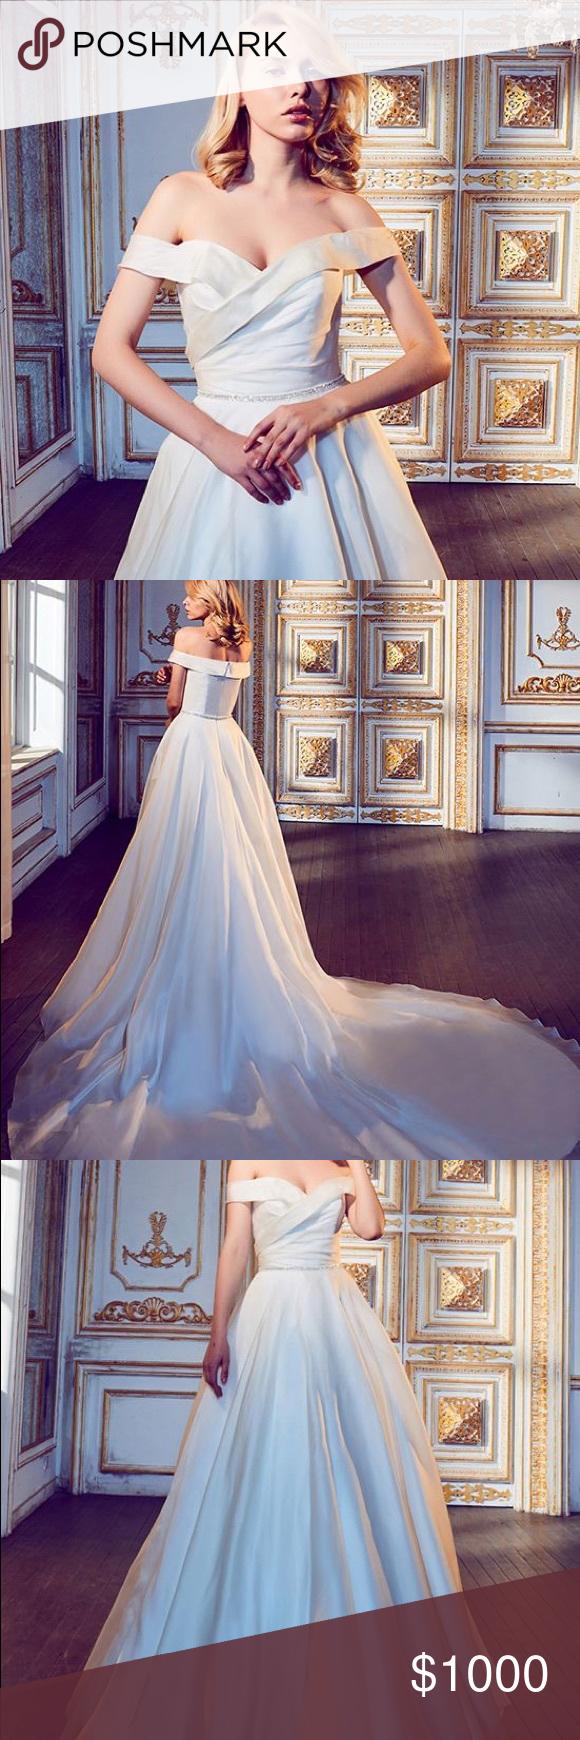 Wedding dress cups  Calla Blanche Sanem Wedding Dress  My Posh Picks  Pinterest